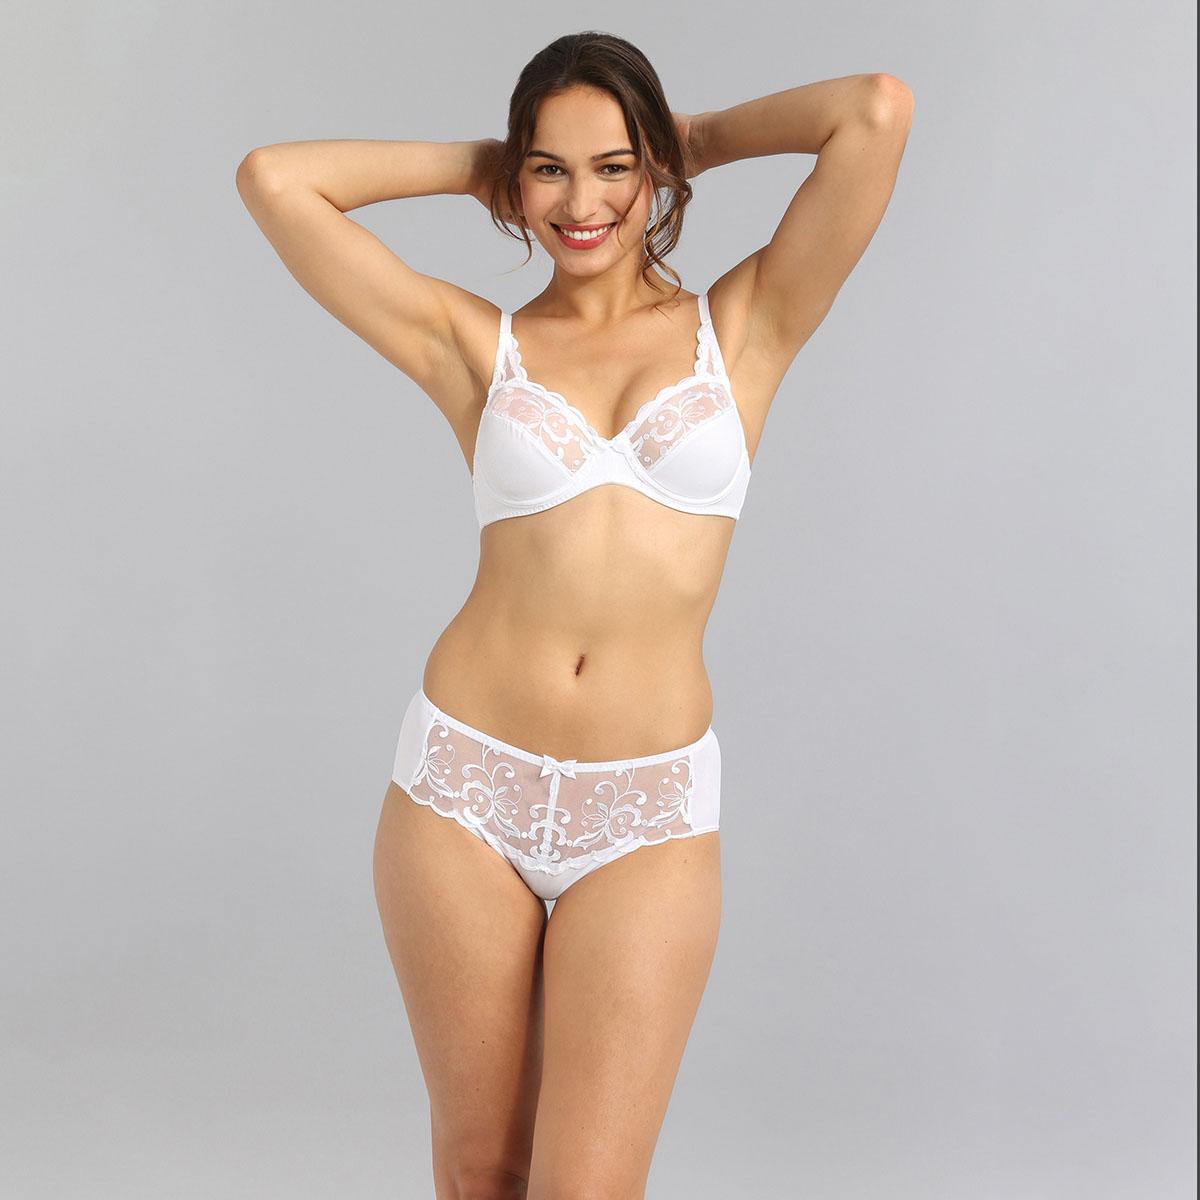 Soutien-gorge avec armatures blanc Essential Elegance Broderie, , PLAYTEX